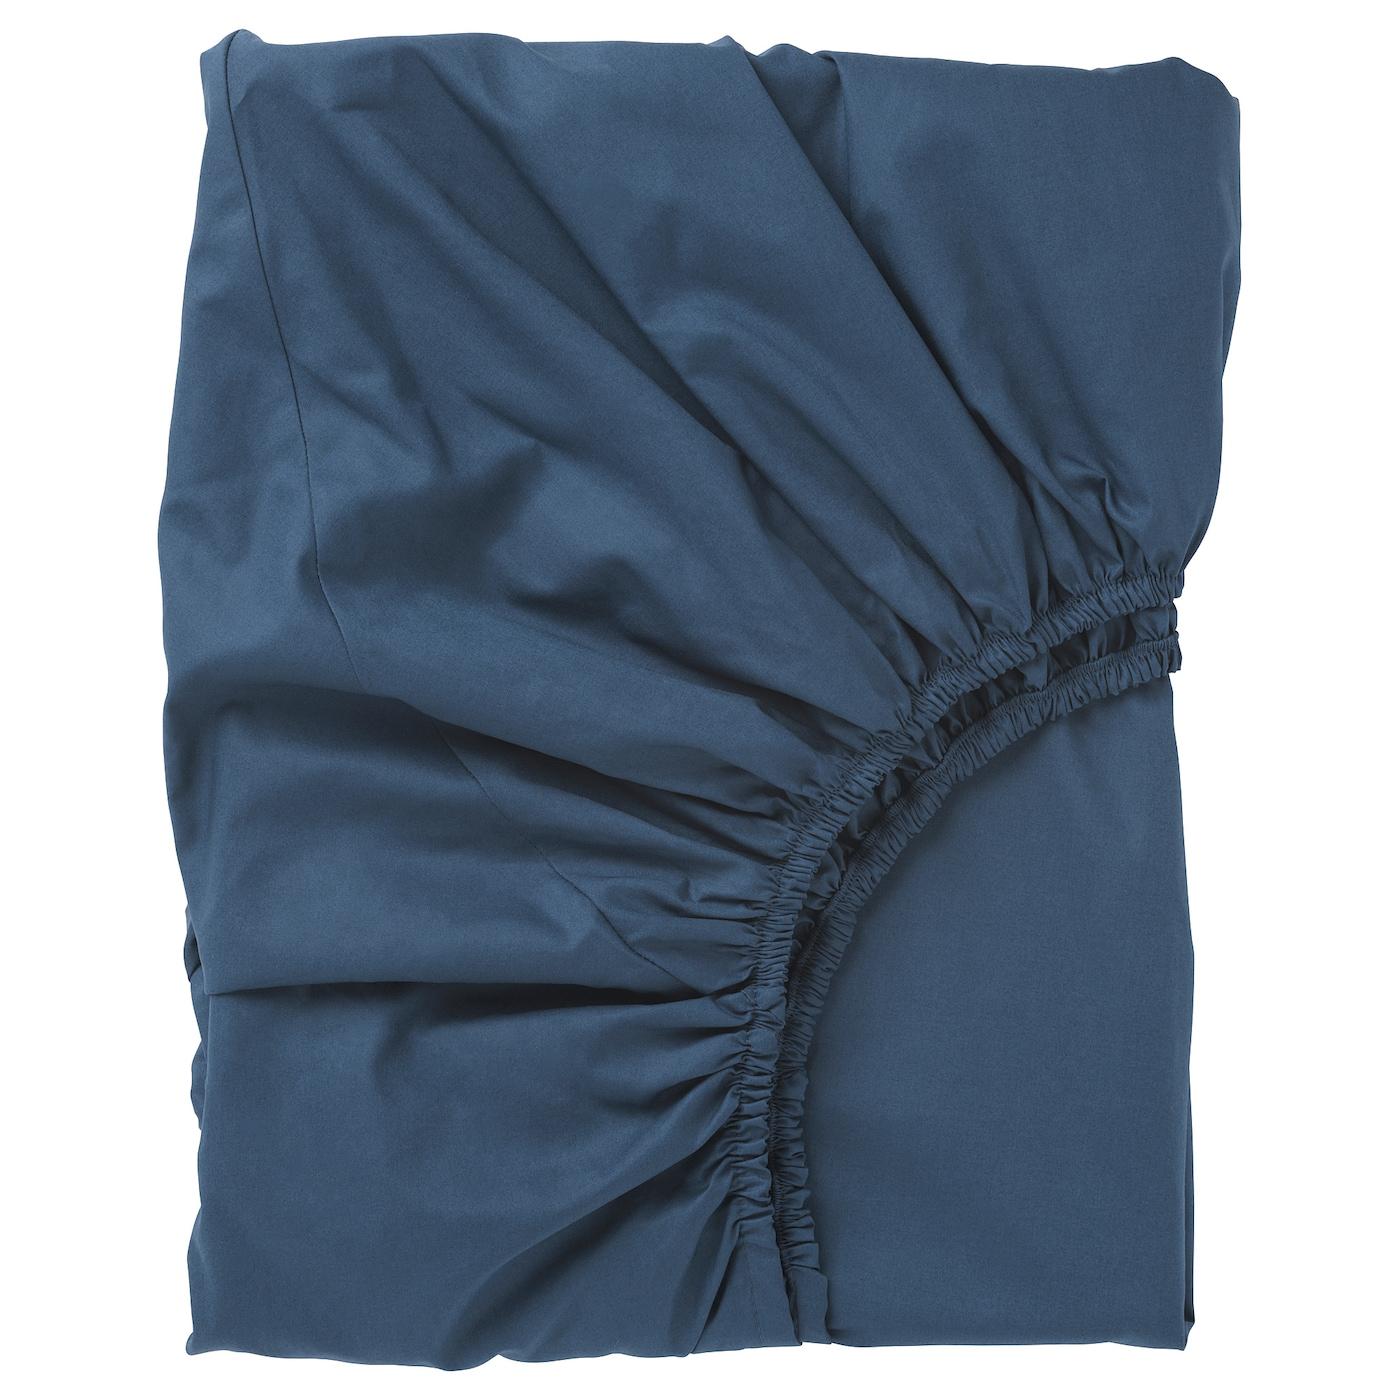 ullvide drap housse bleu fonc 160 x 200 cm ikea. Black Bedroom Furniture Sets. Home Design Ideas